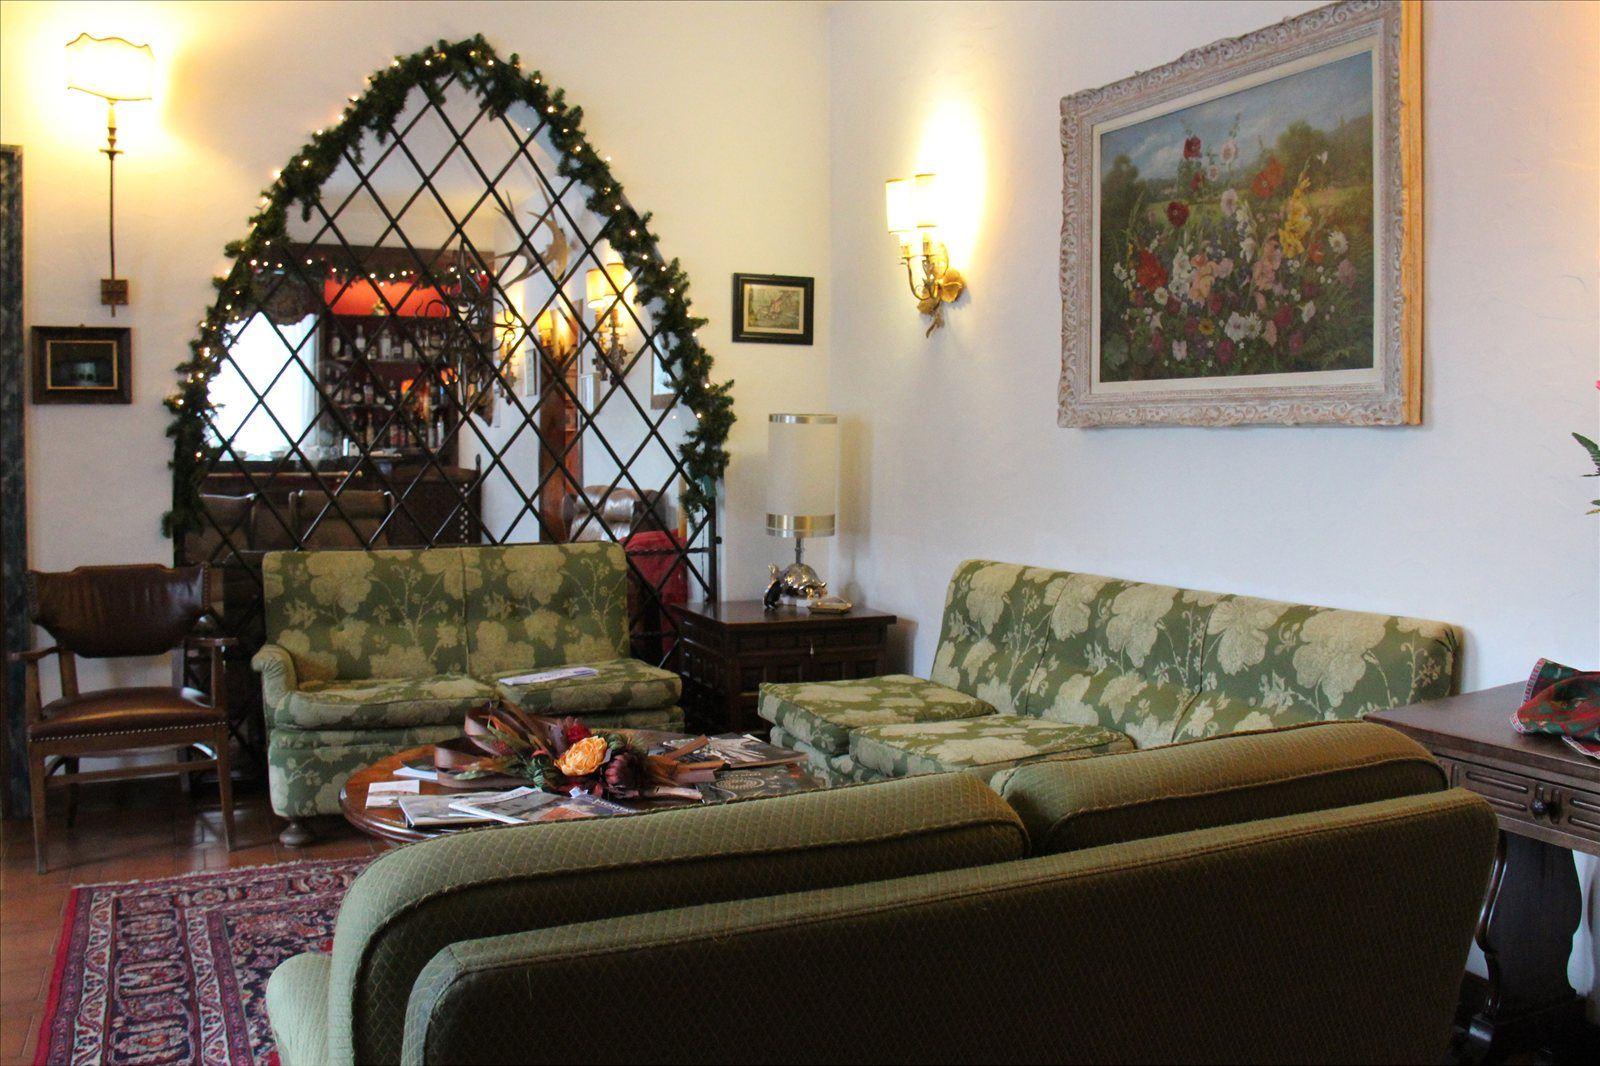 Hotel Capannina - Cortina d'Ampezzo